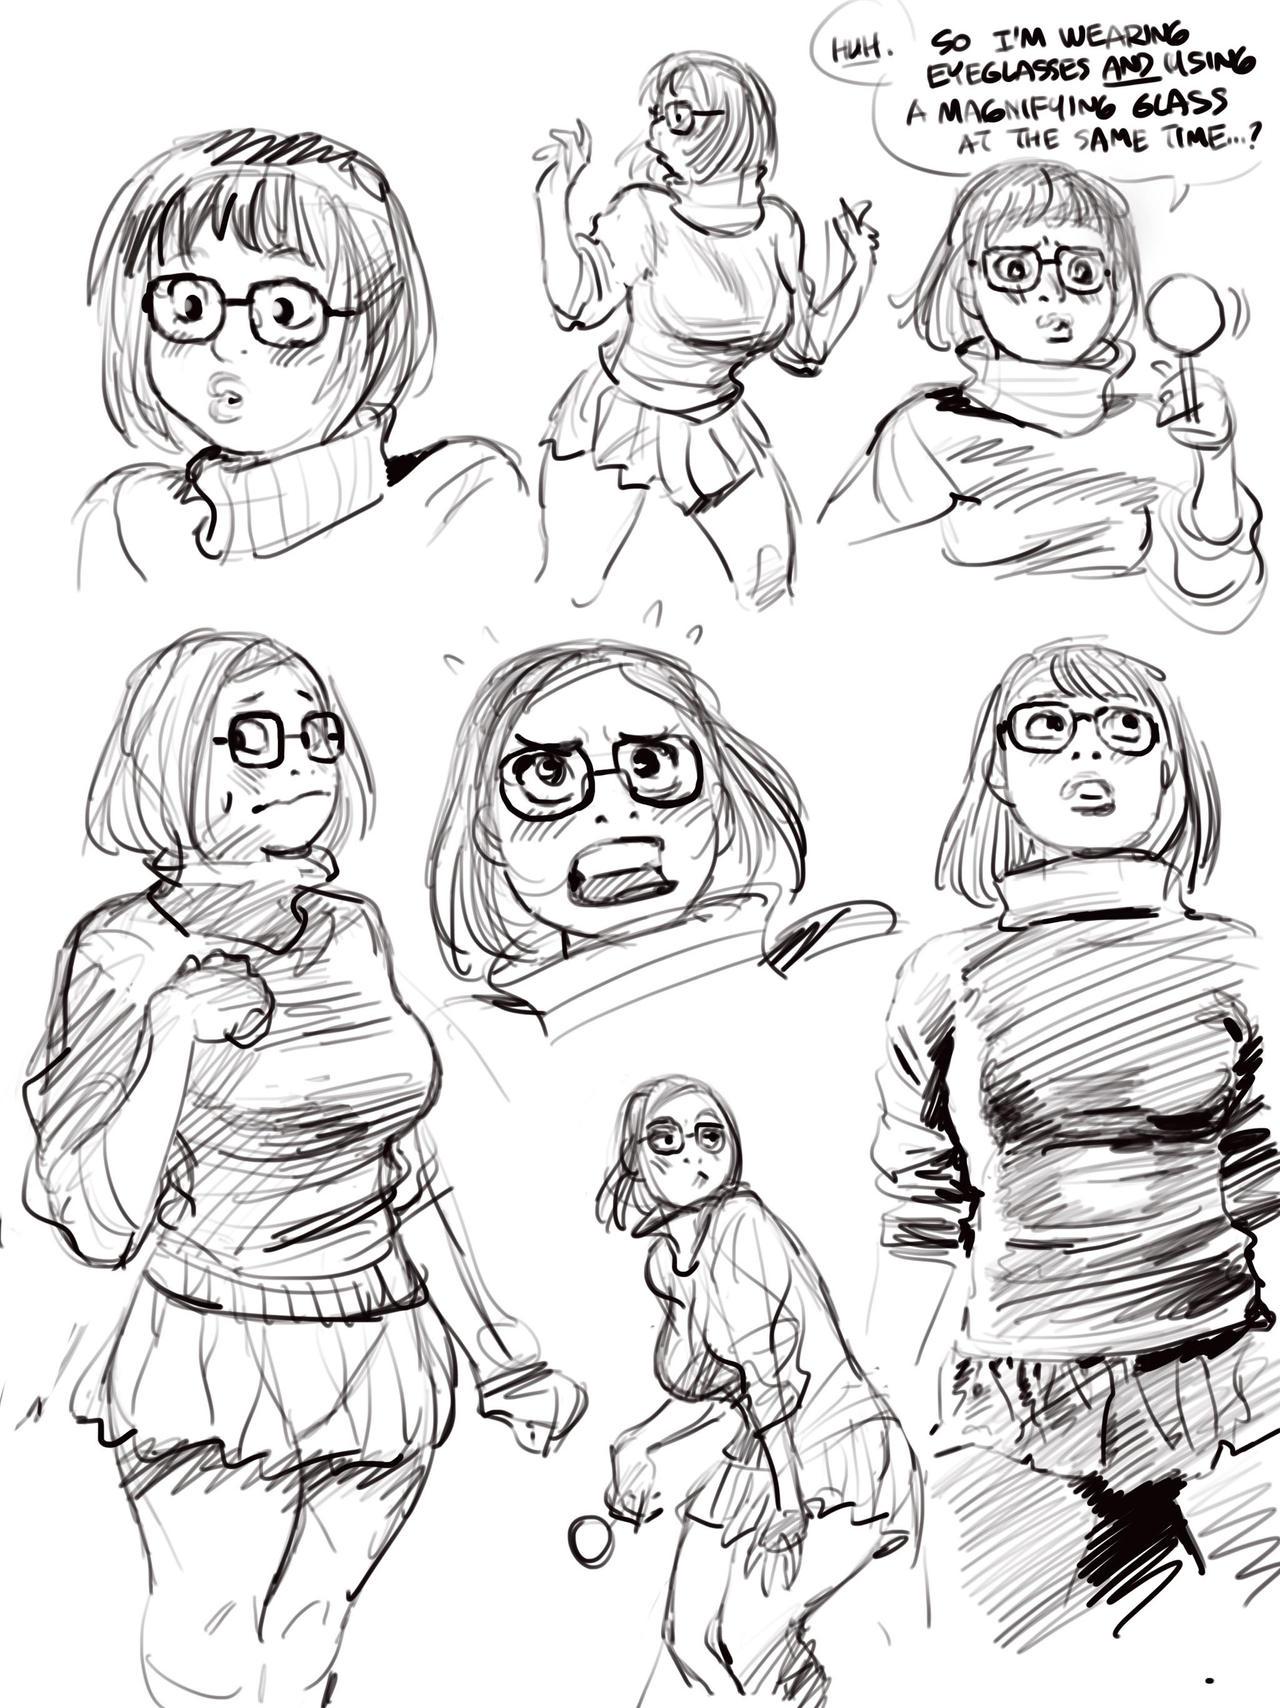 Sketch set of SCOOBY DOO's Velma, via Procreate